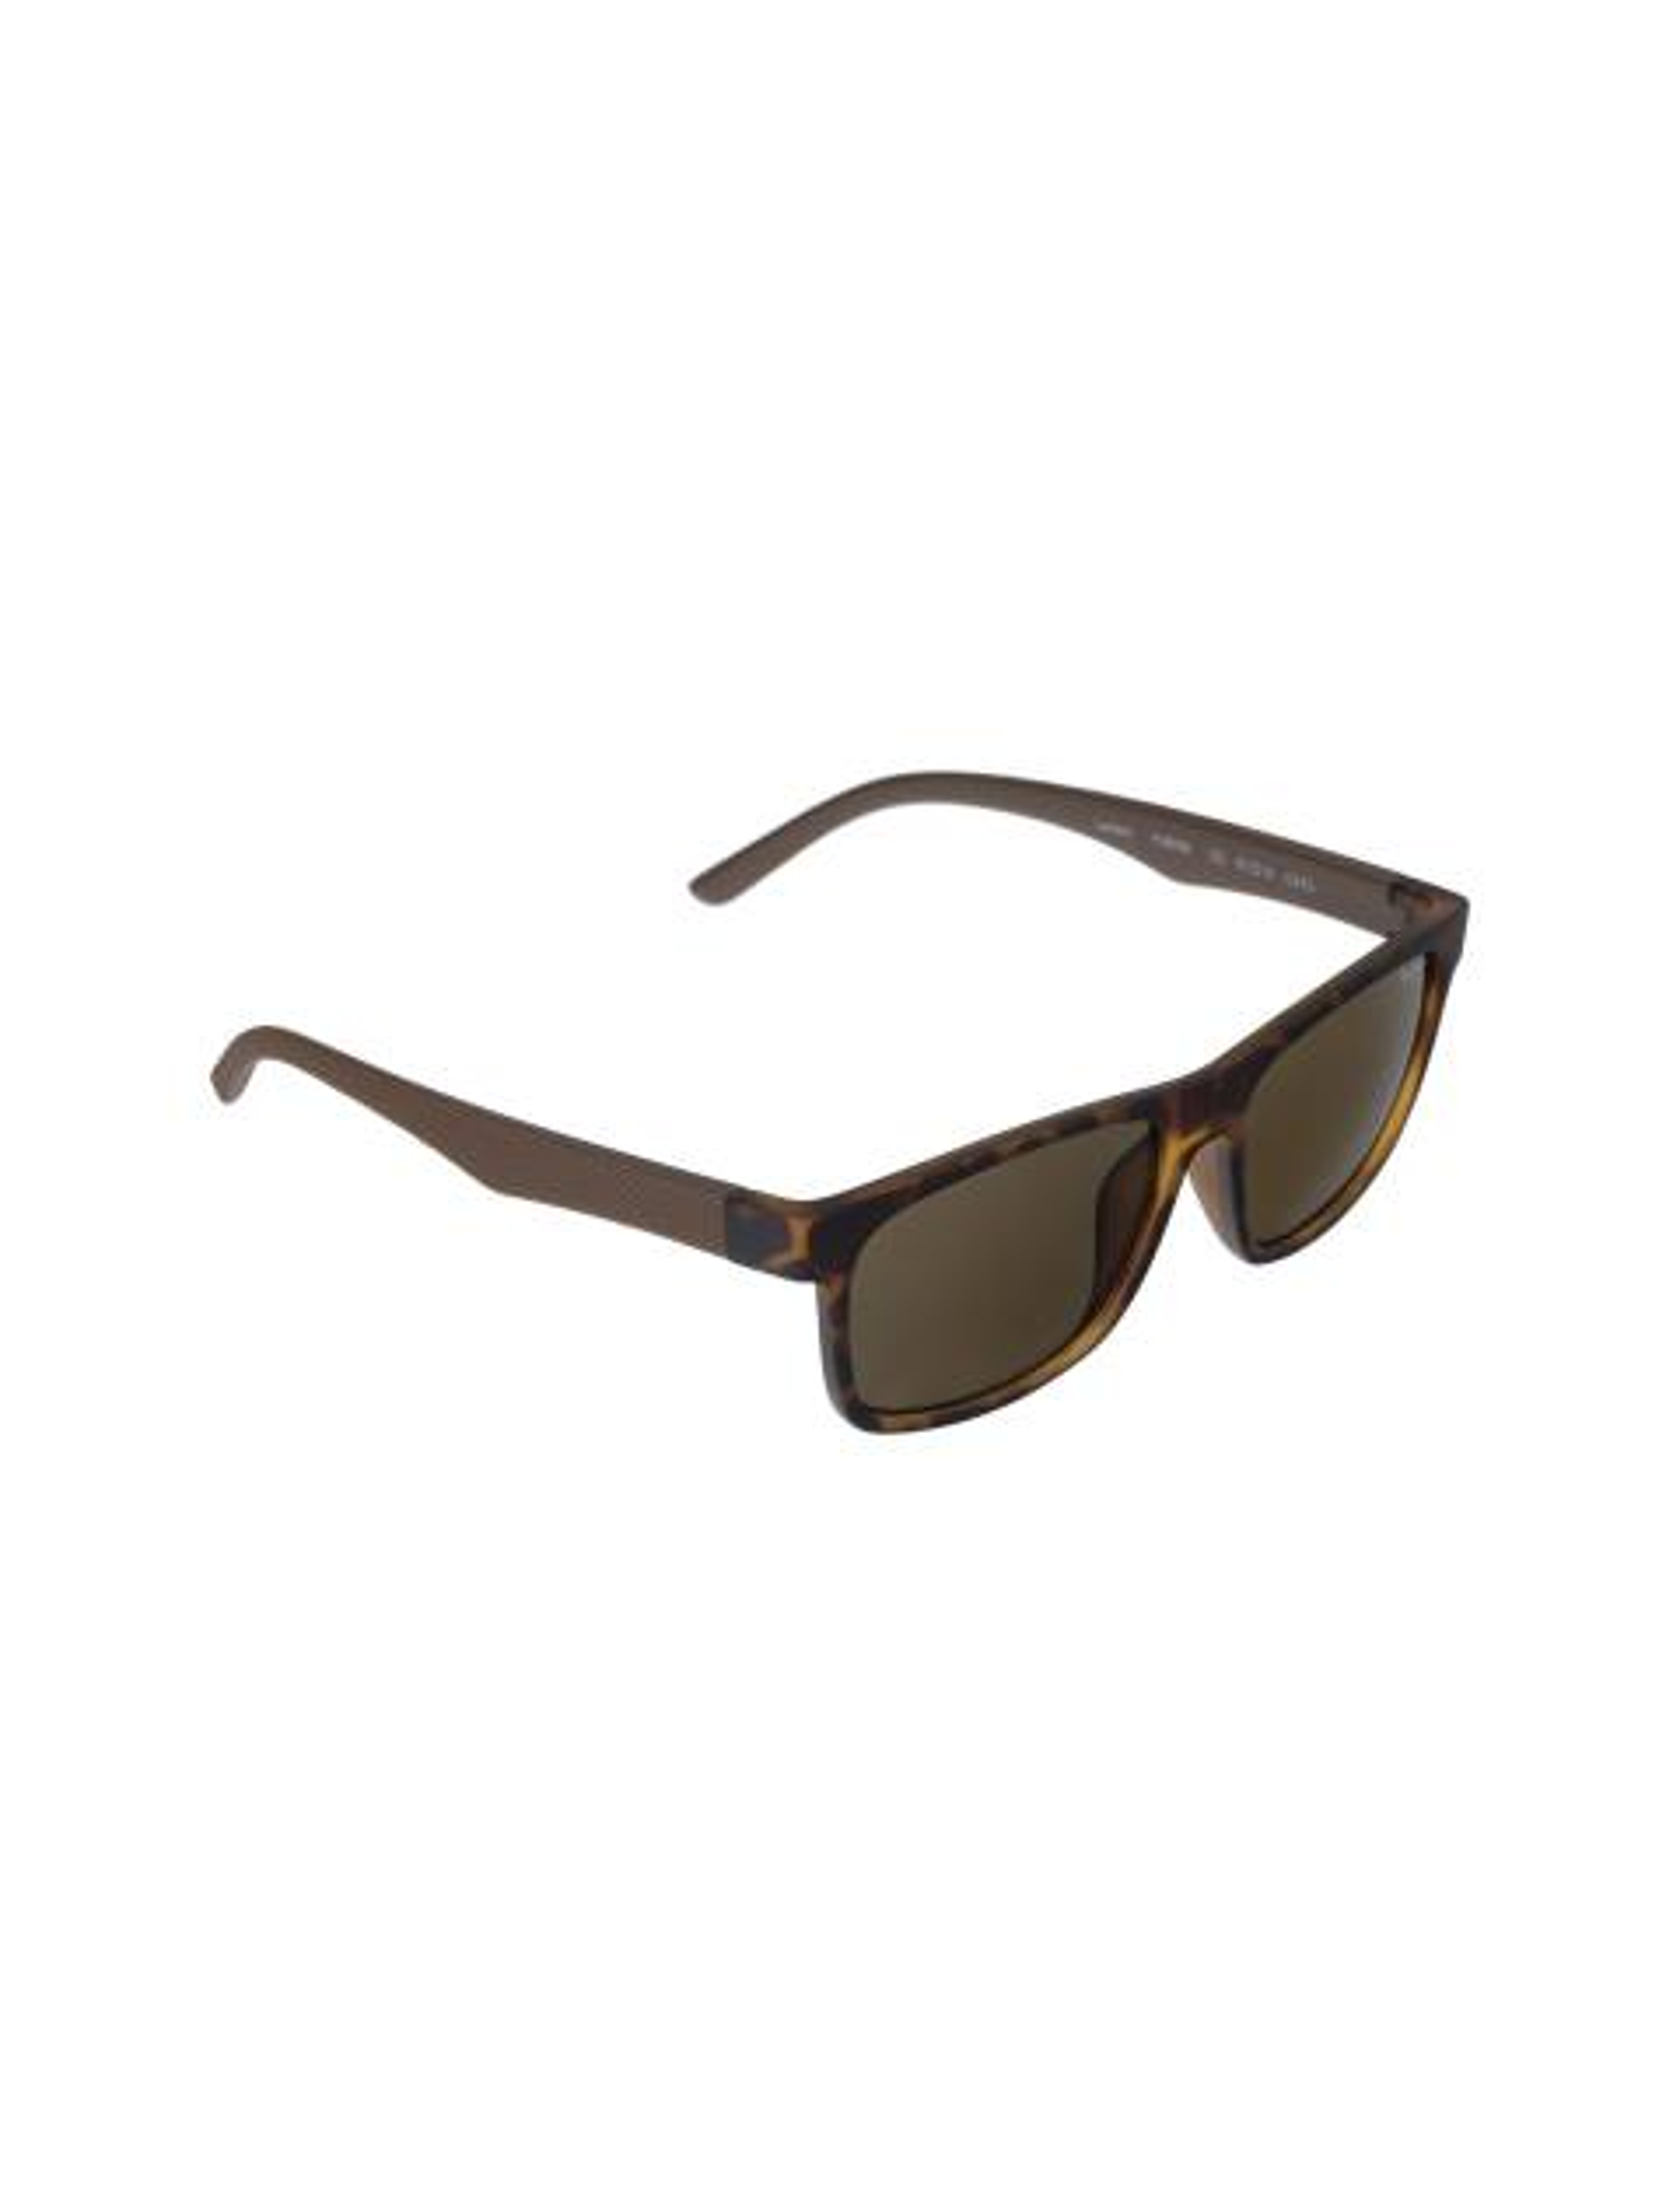 عینک آفتابی ویفرر زنانه - قهوه اي - 2